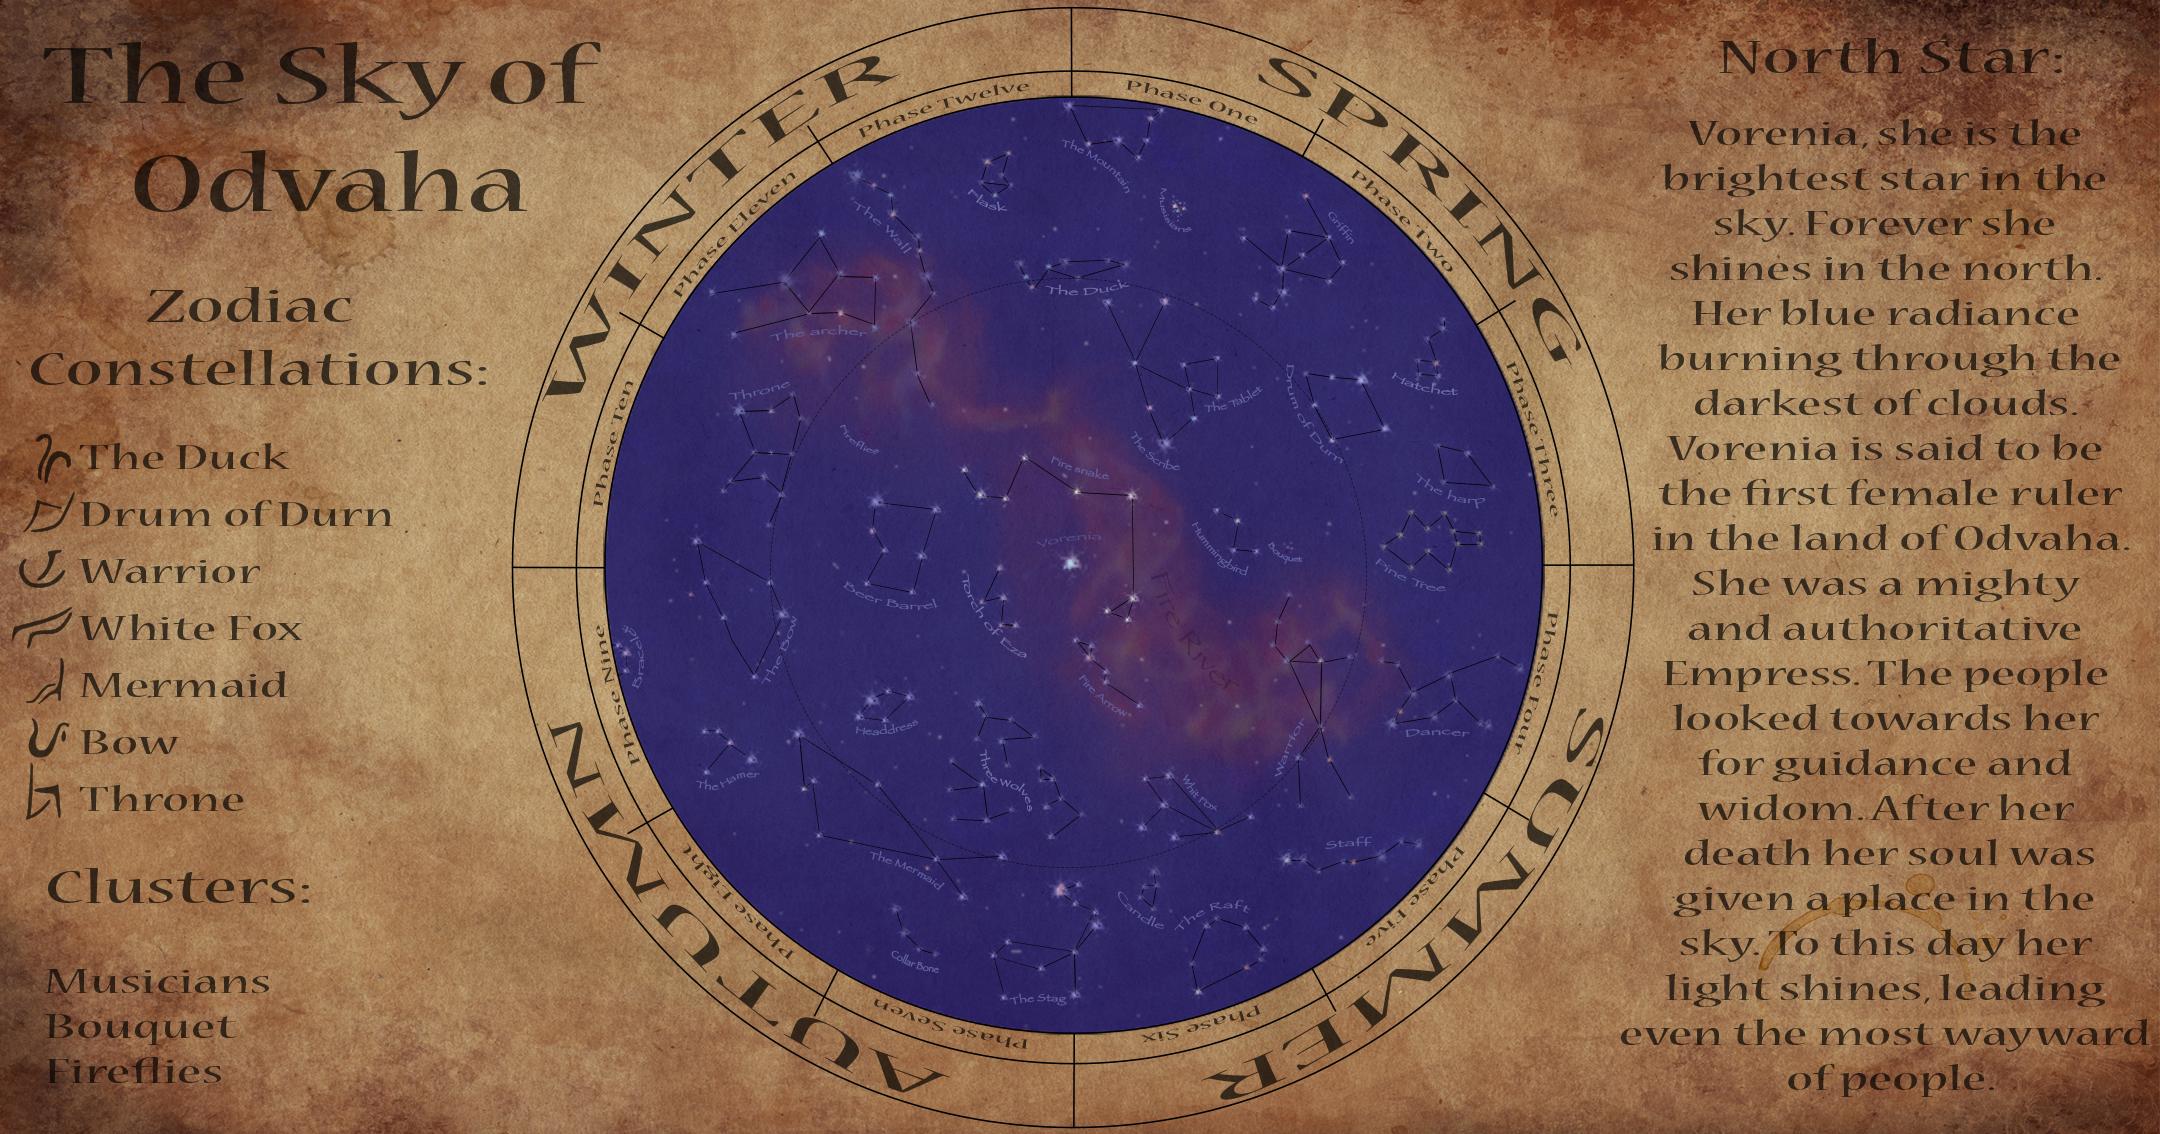 Odvaha Fantasy Star Map Created By Domino44 Domino 44 Epic Maps